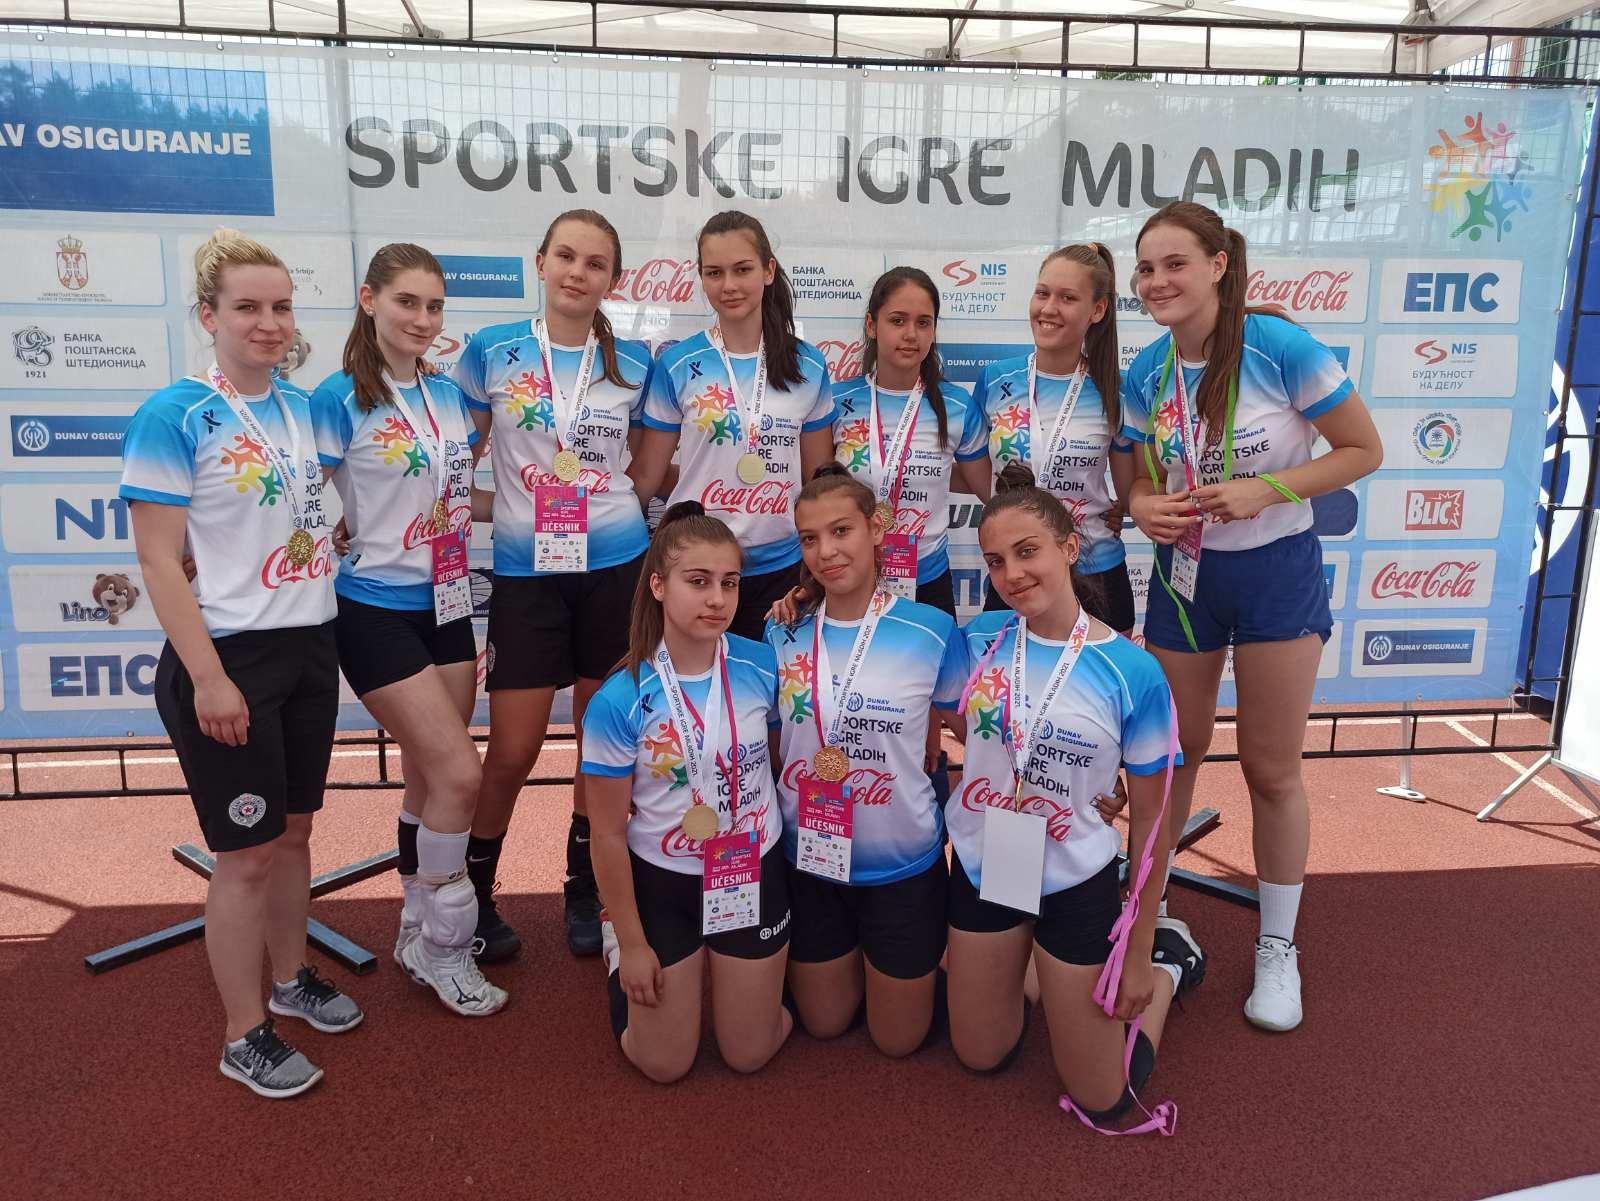 sportske igre mladih jul2021-1